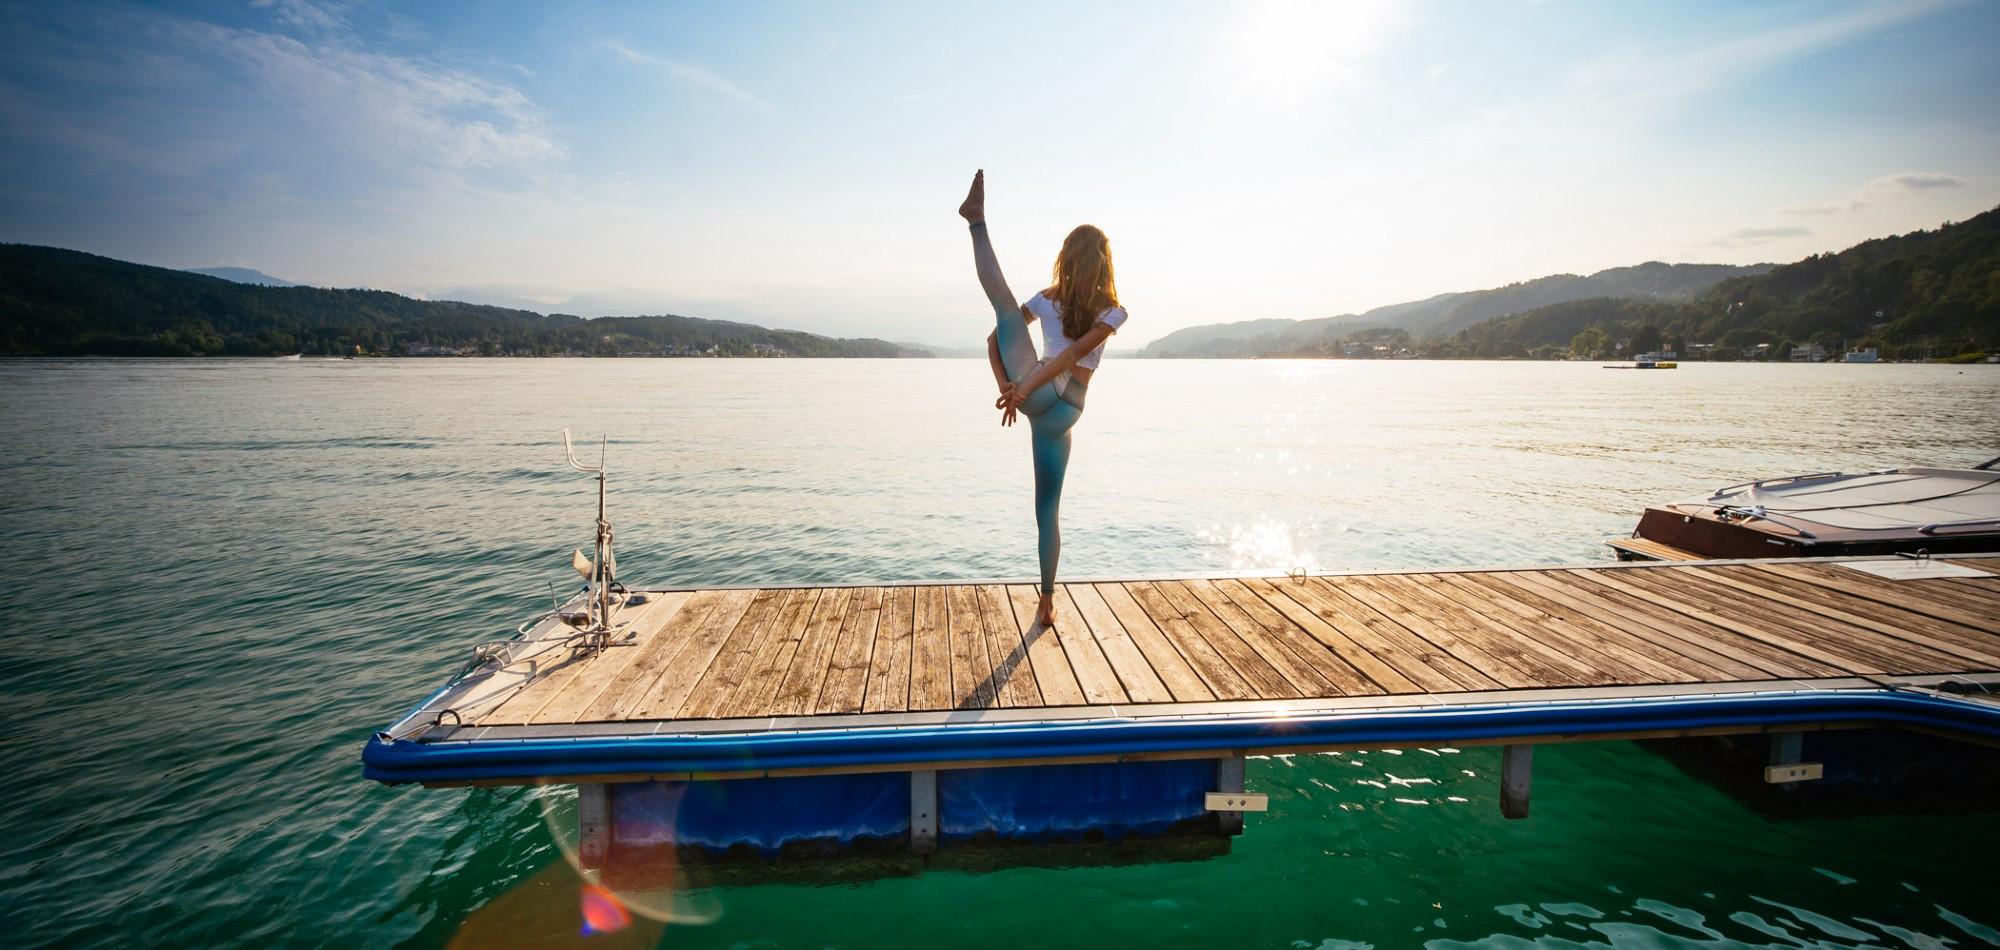 Namaste am See: Wandern & Yoga